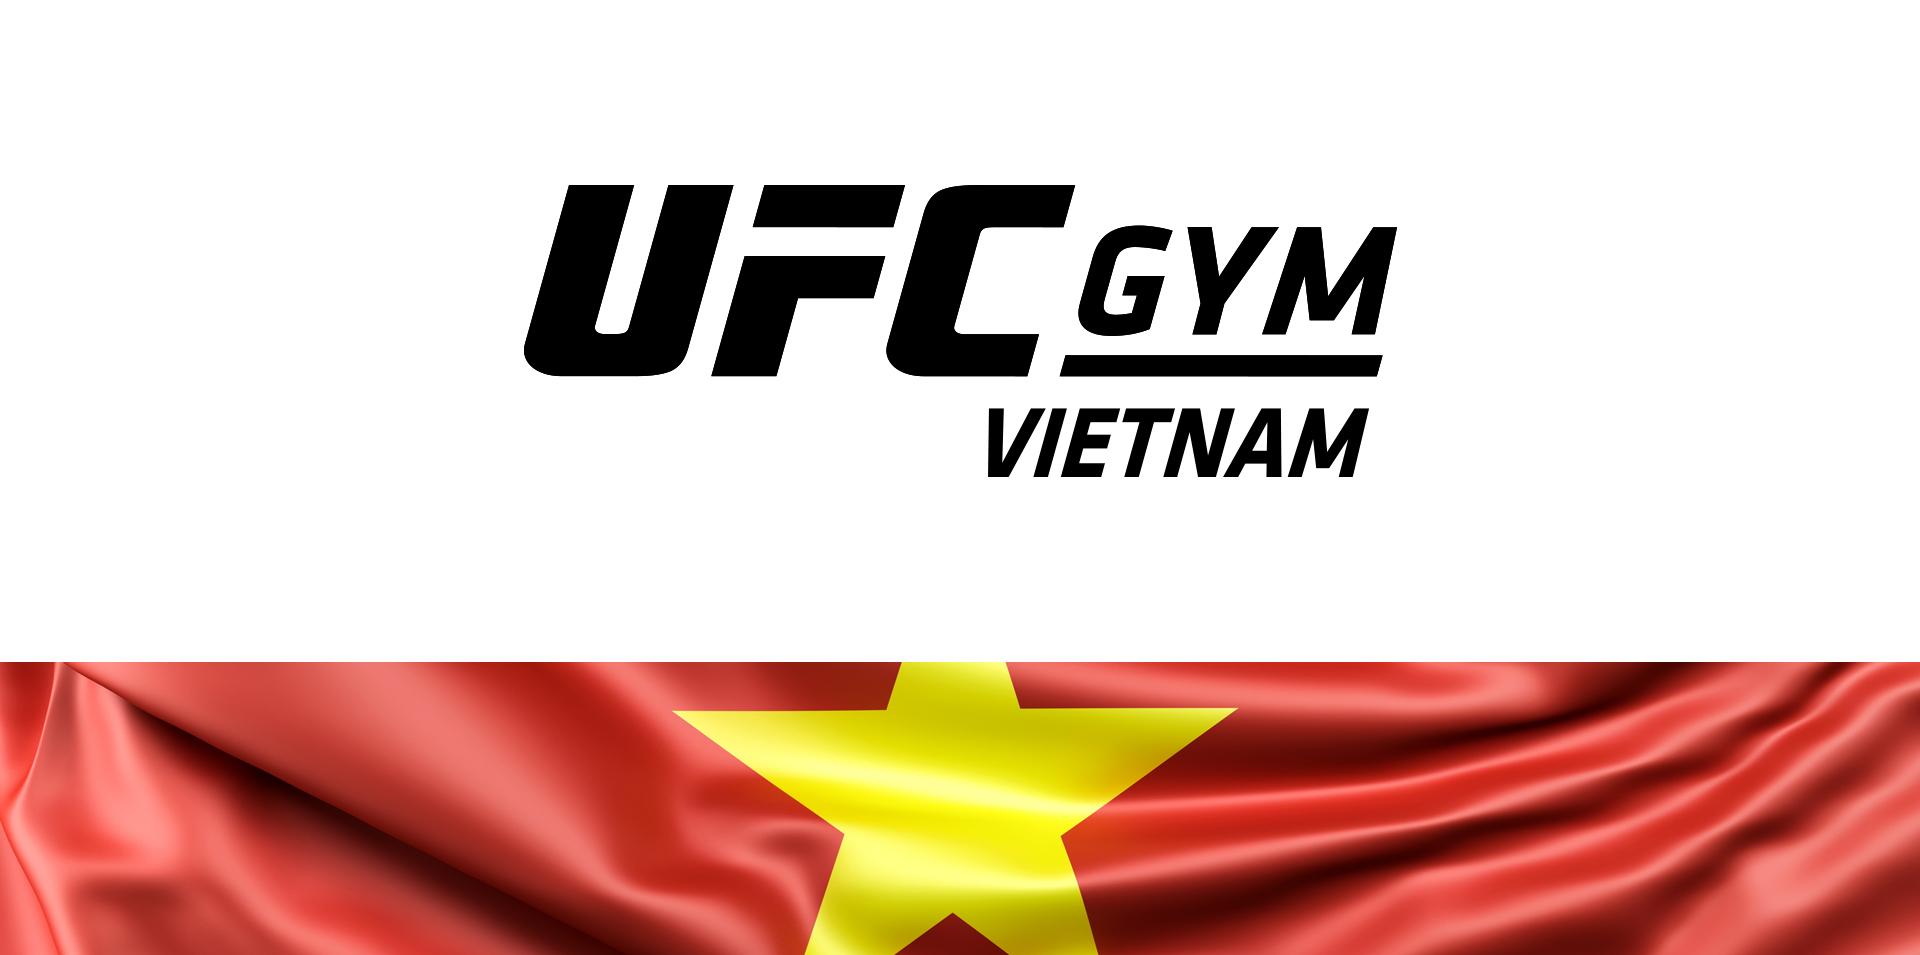 Vietnam Featured Image